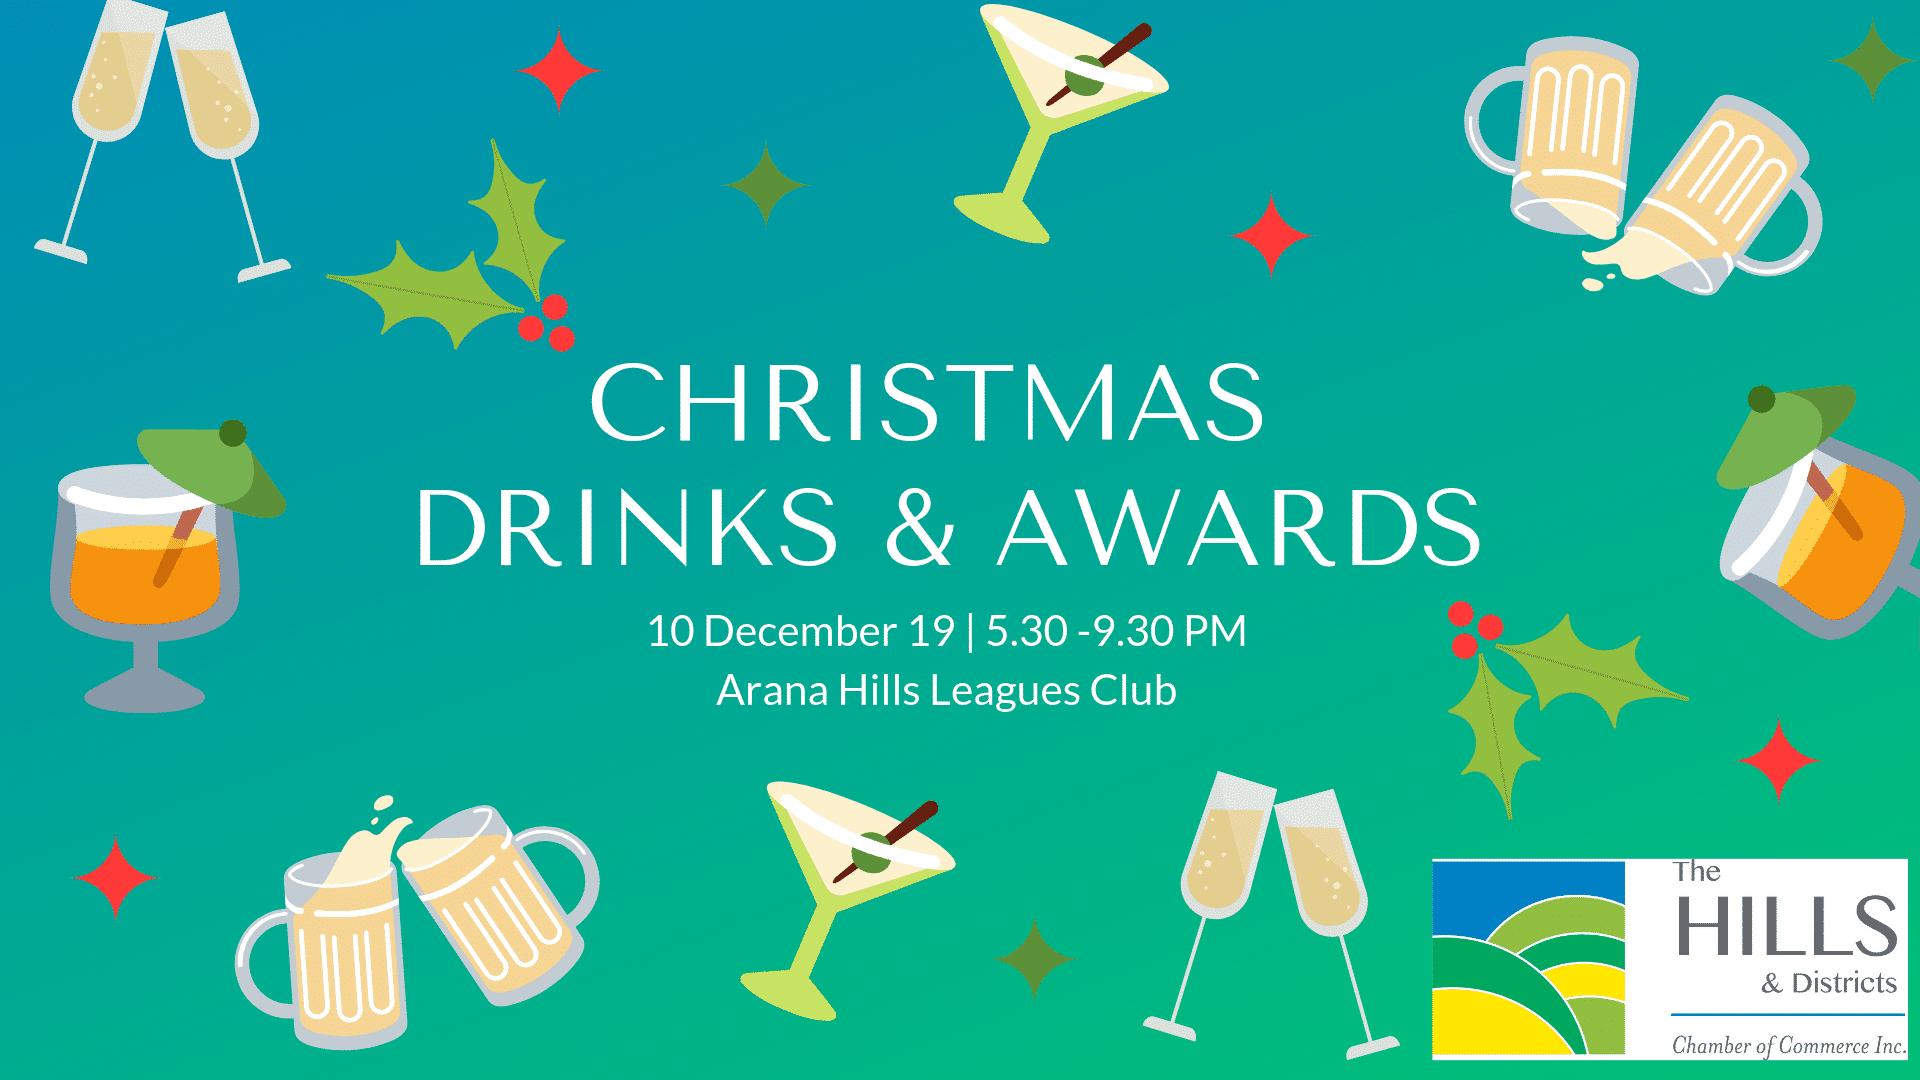 Christmas Drinks & Awards